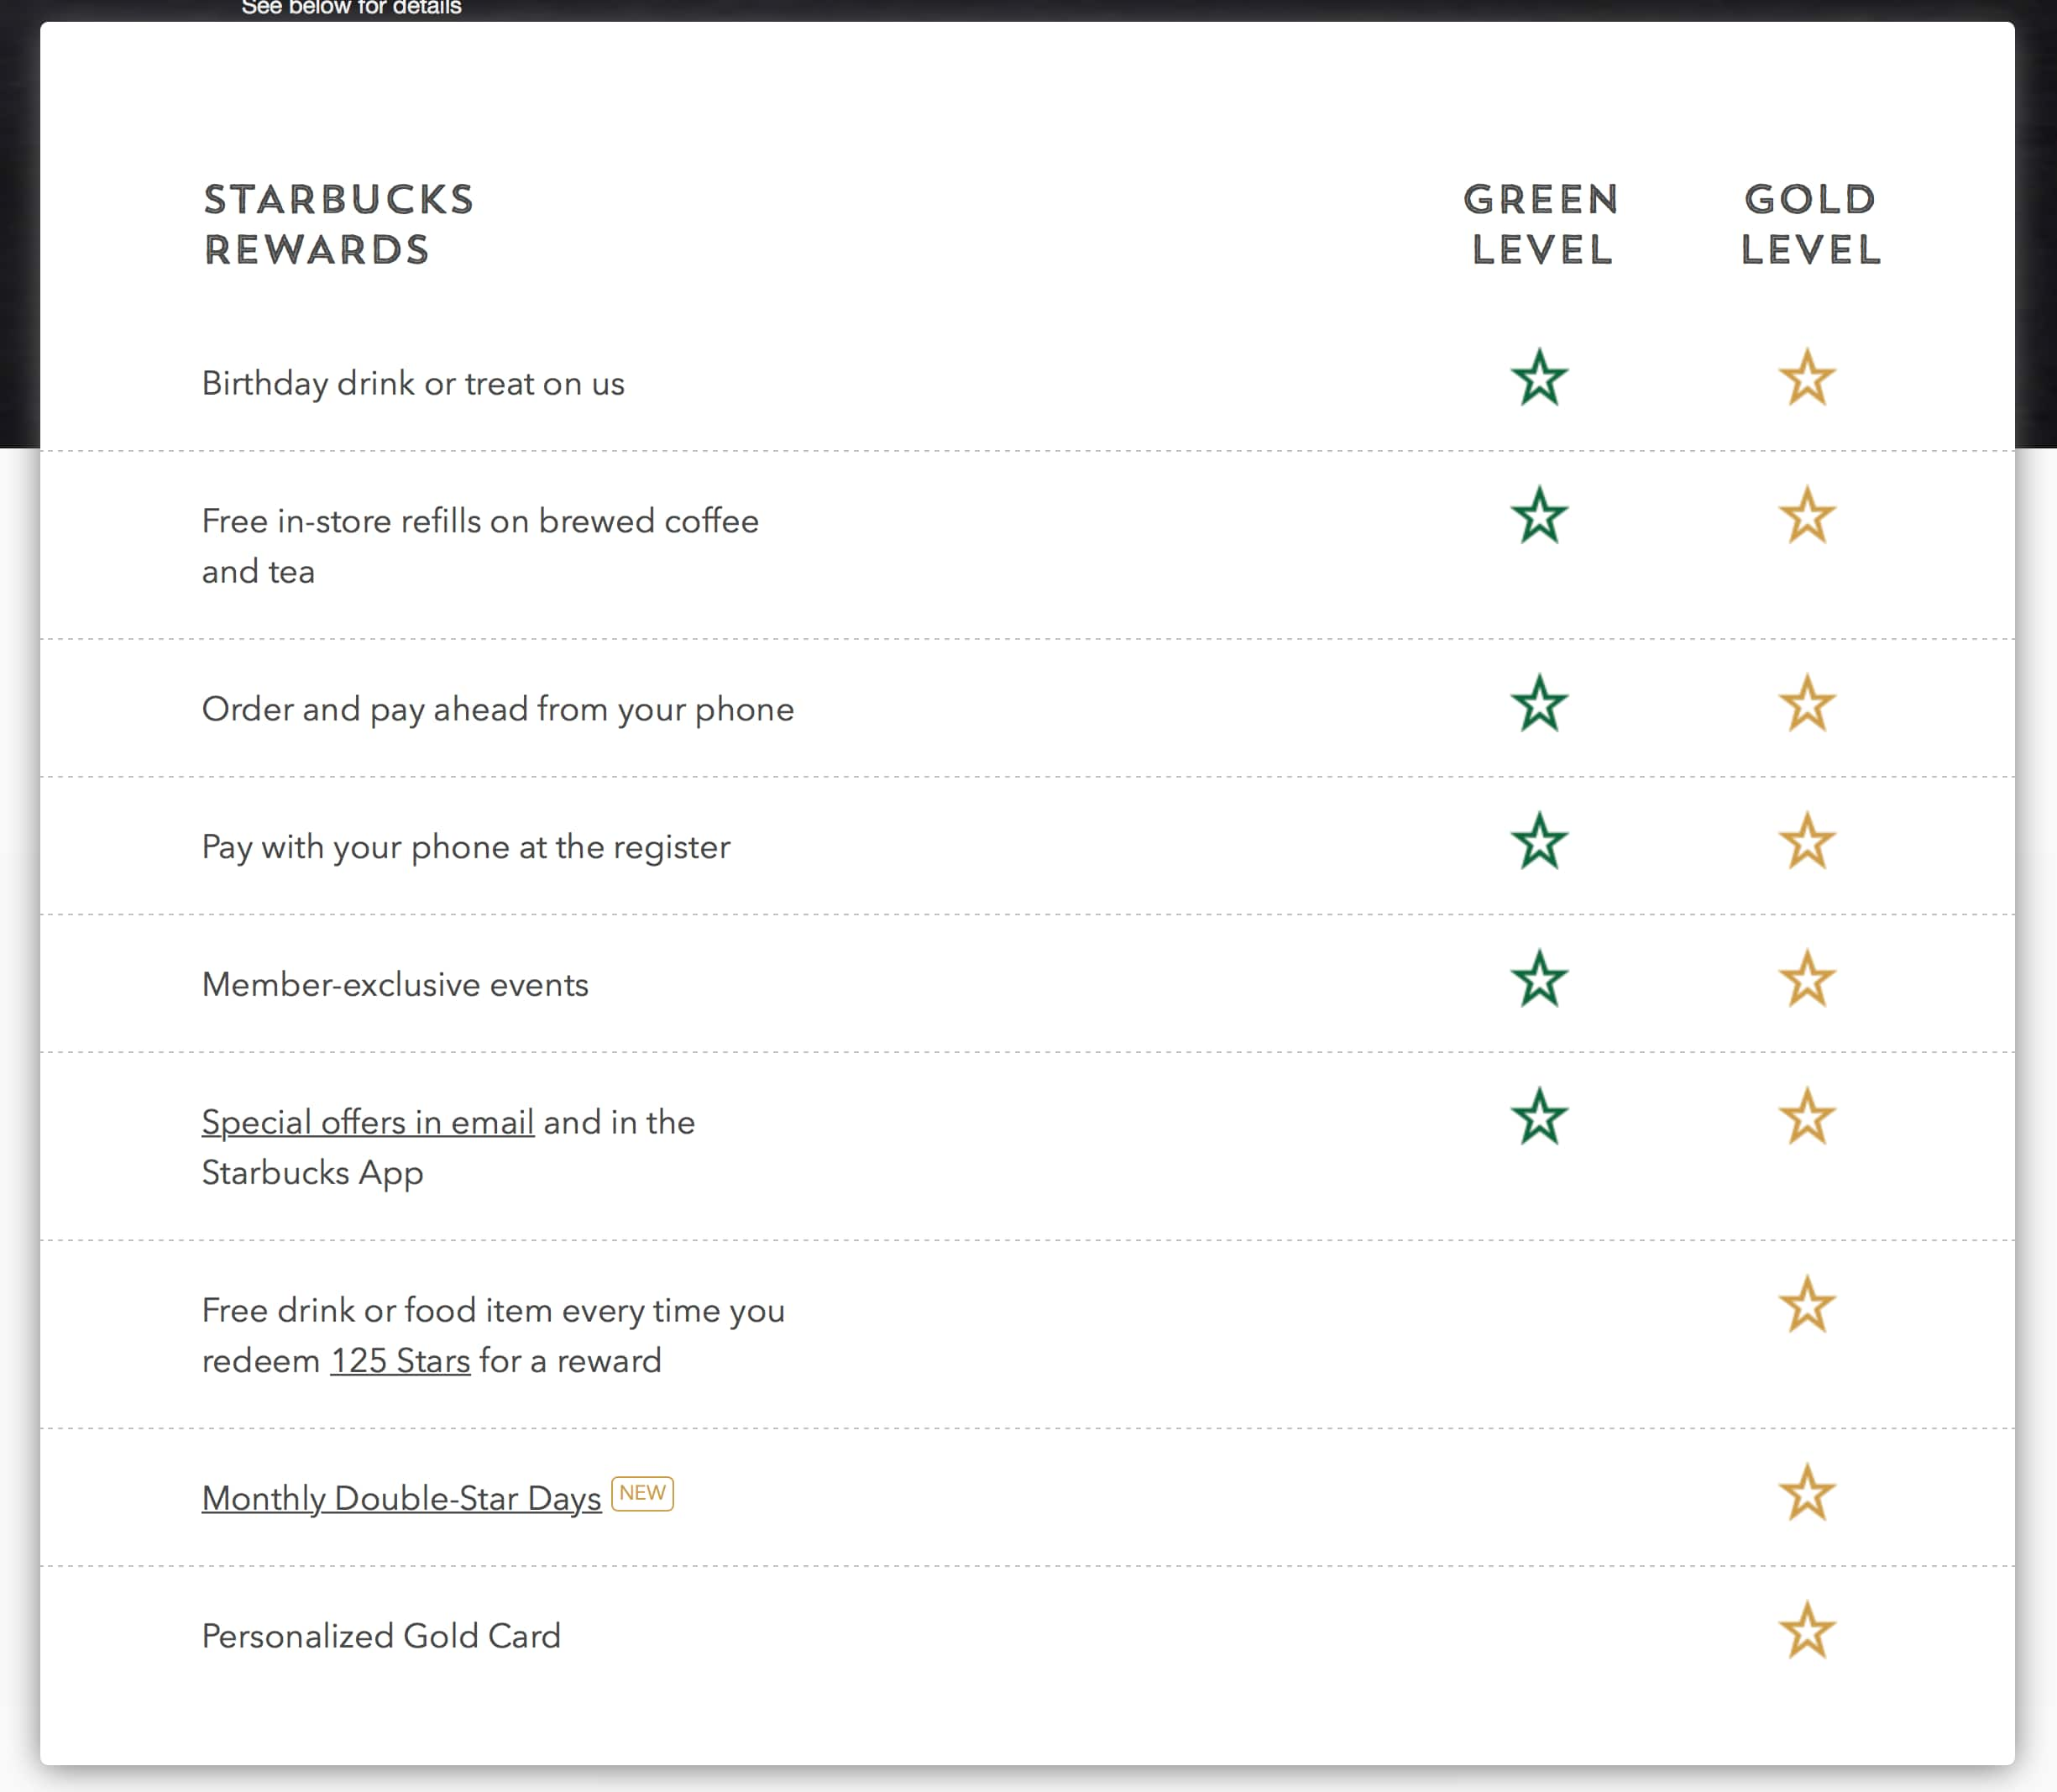 Green and Gold Rewards Comparison